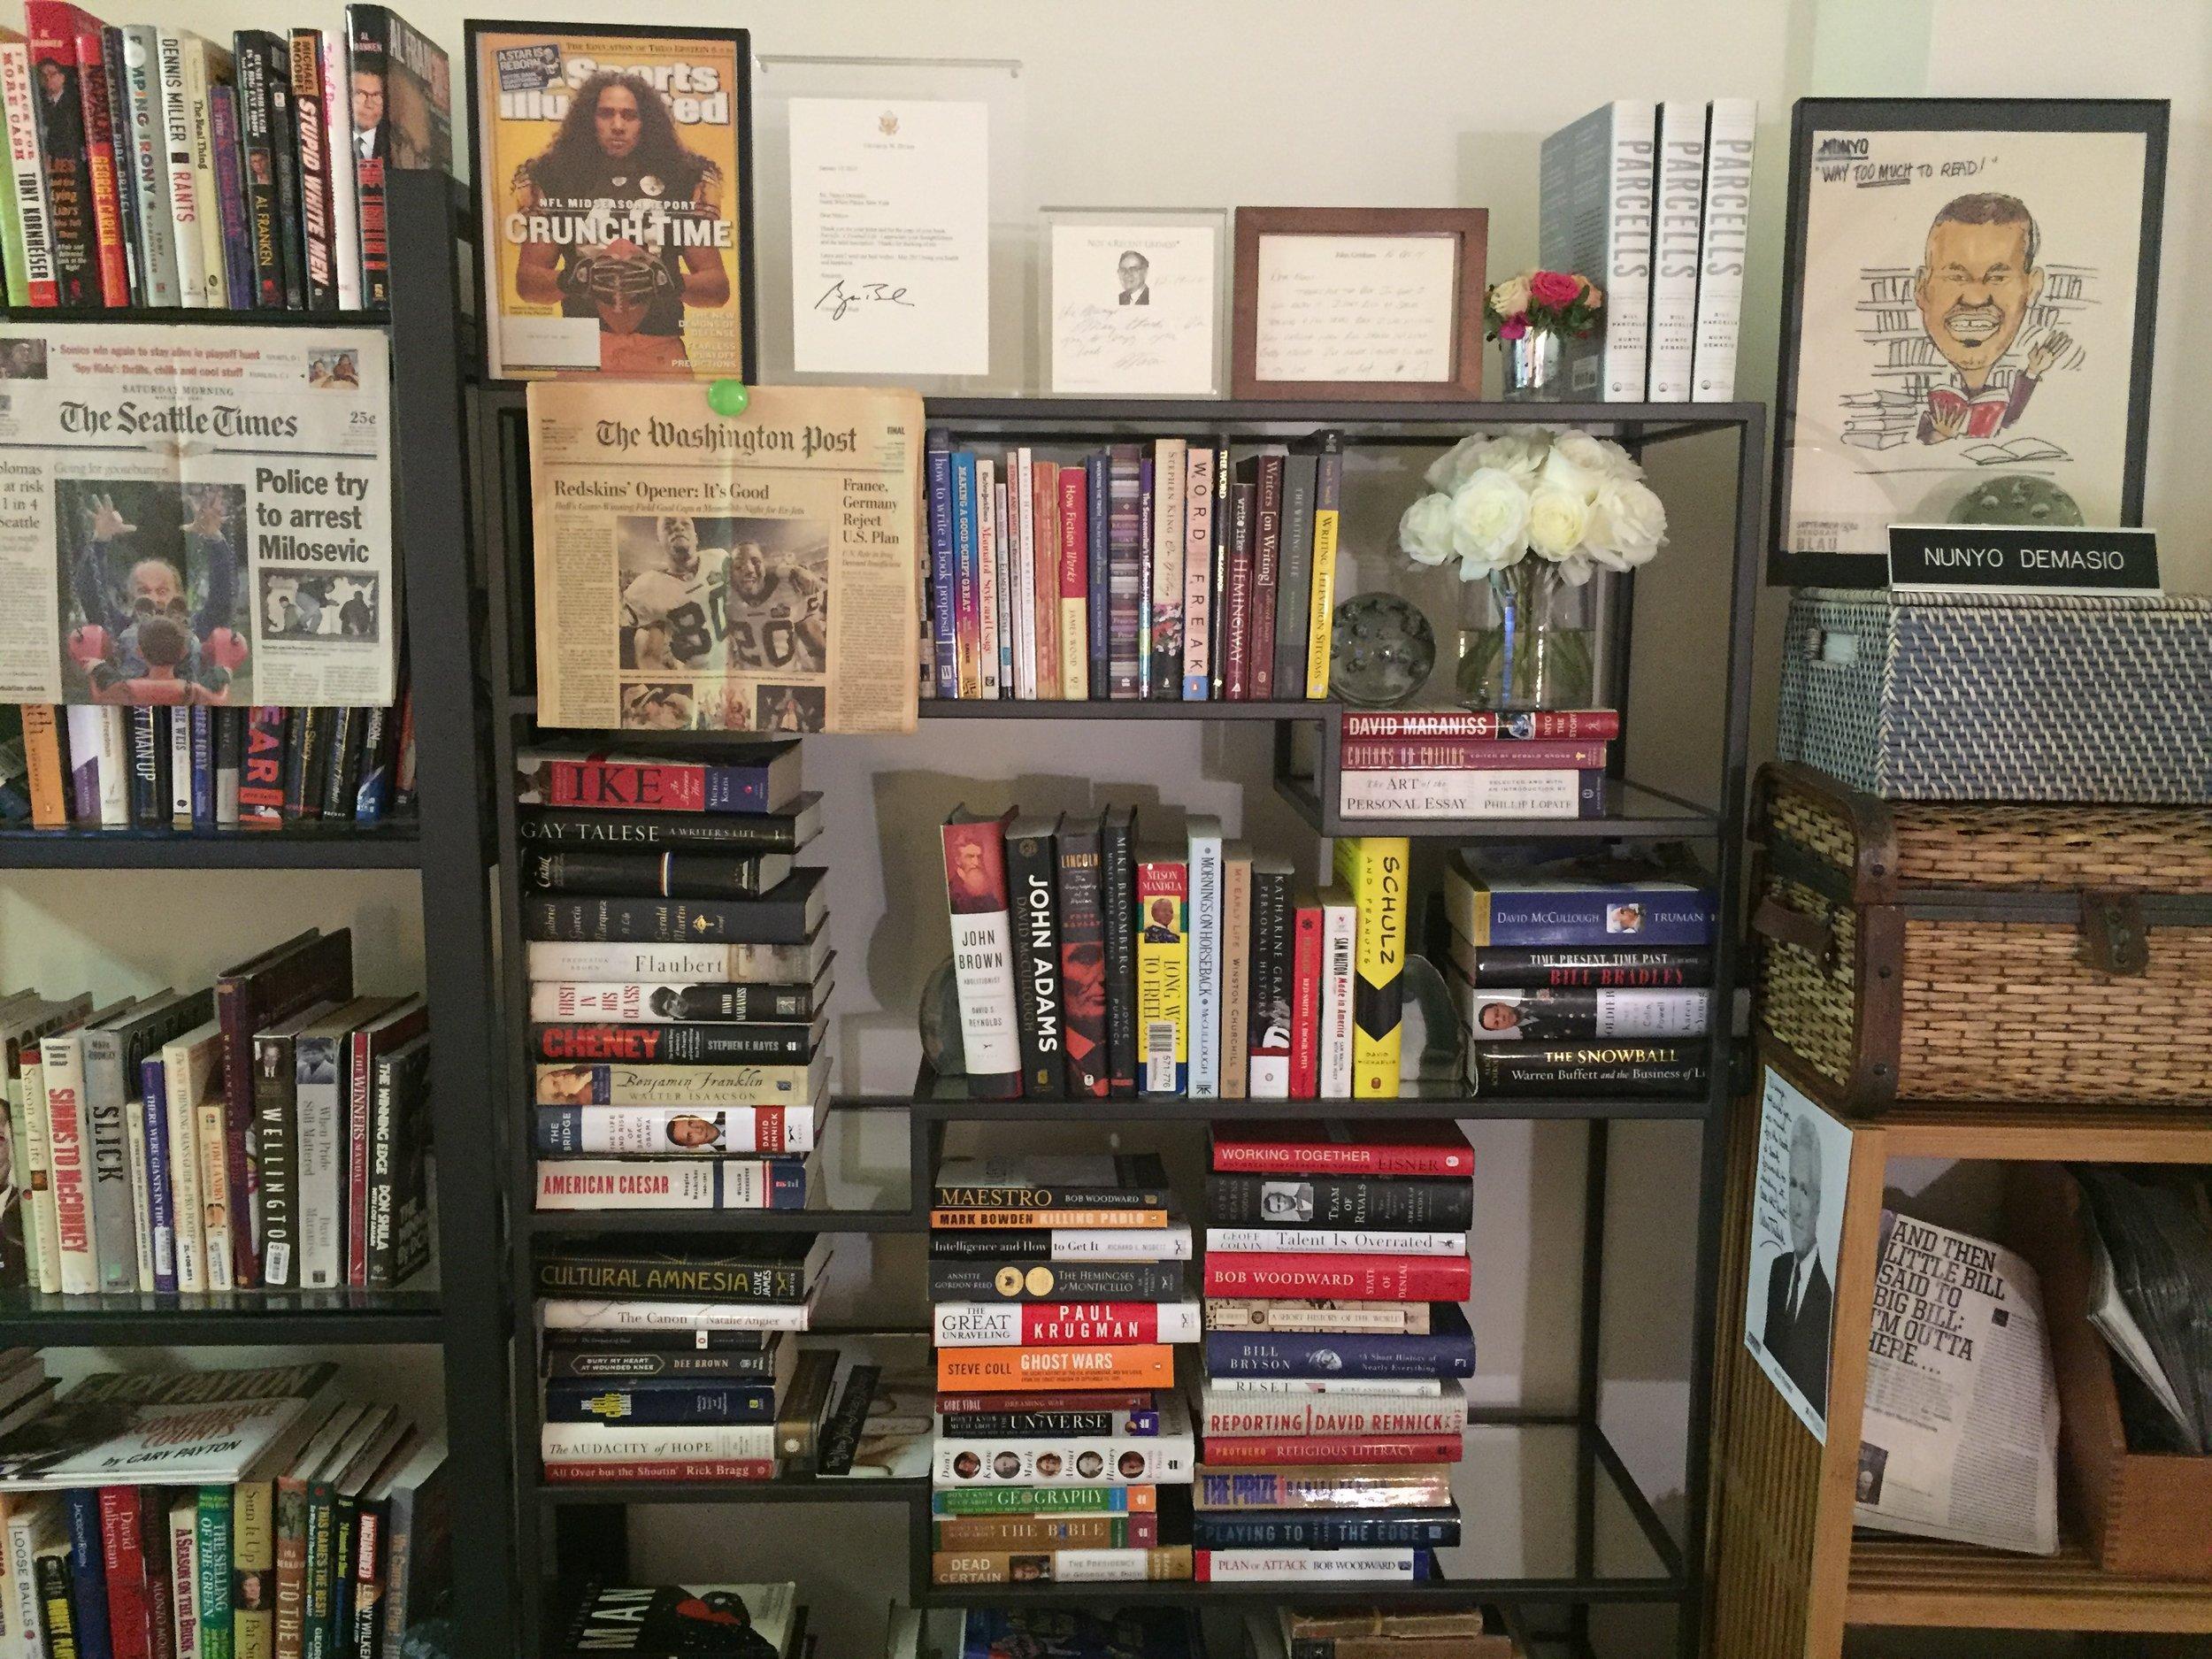 Alas, no more room on my bookshelf.